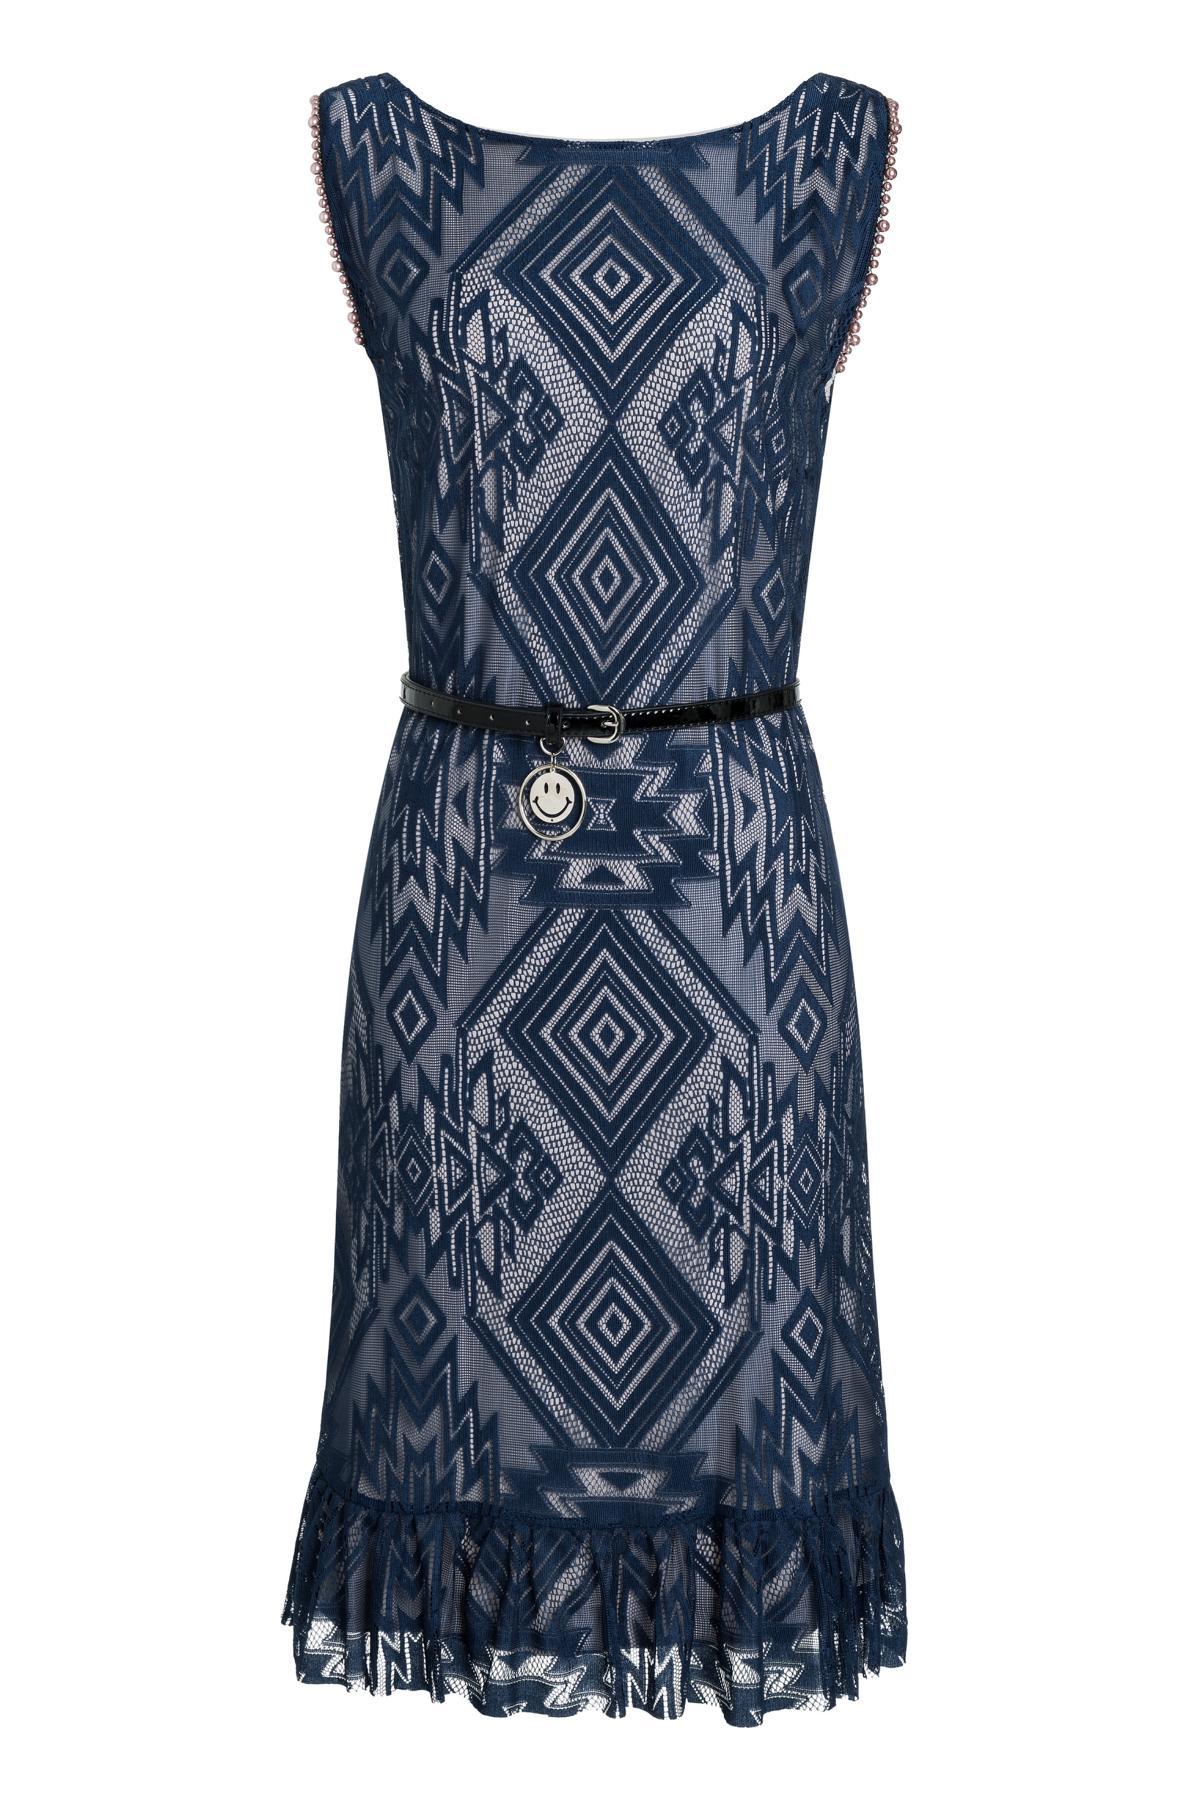 Ana Alcazar Sleeveless Dress Saprona